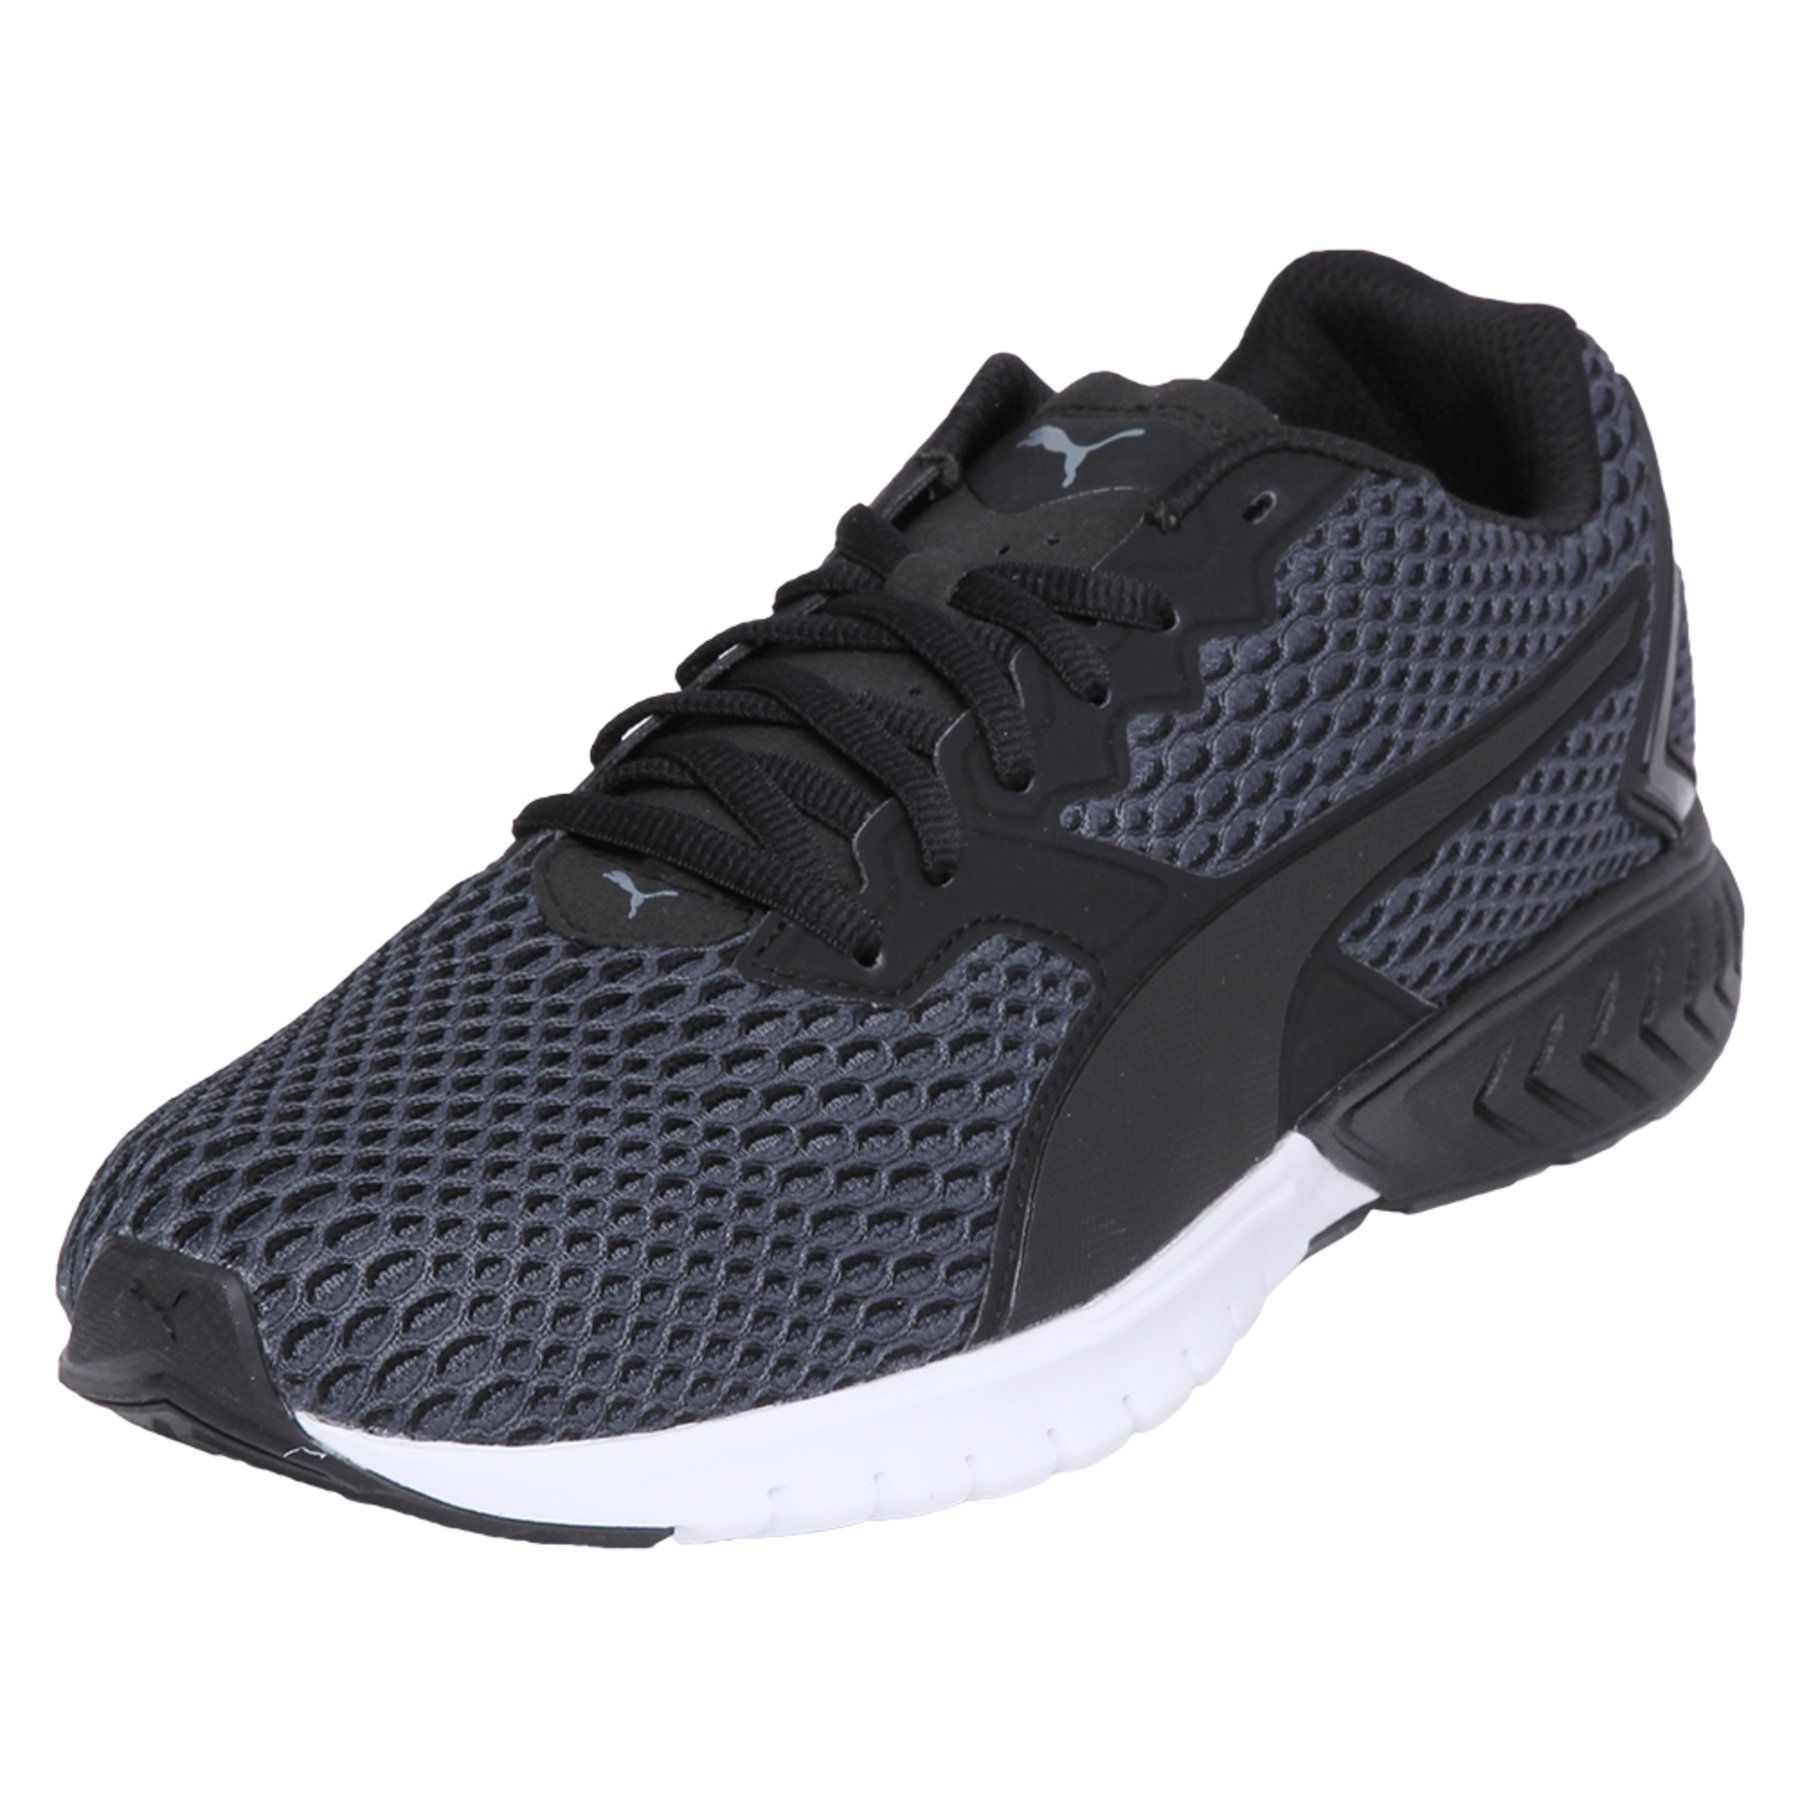 Ignite Black Sneakers Buy Puma New Casual Dual Core Shoes LRqcj435AS